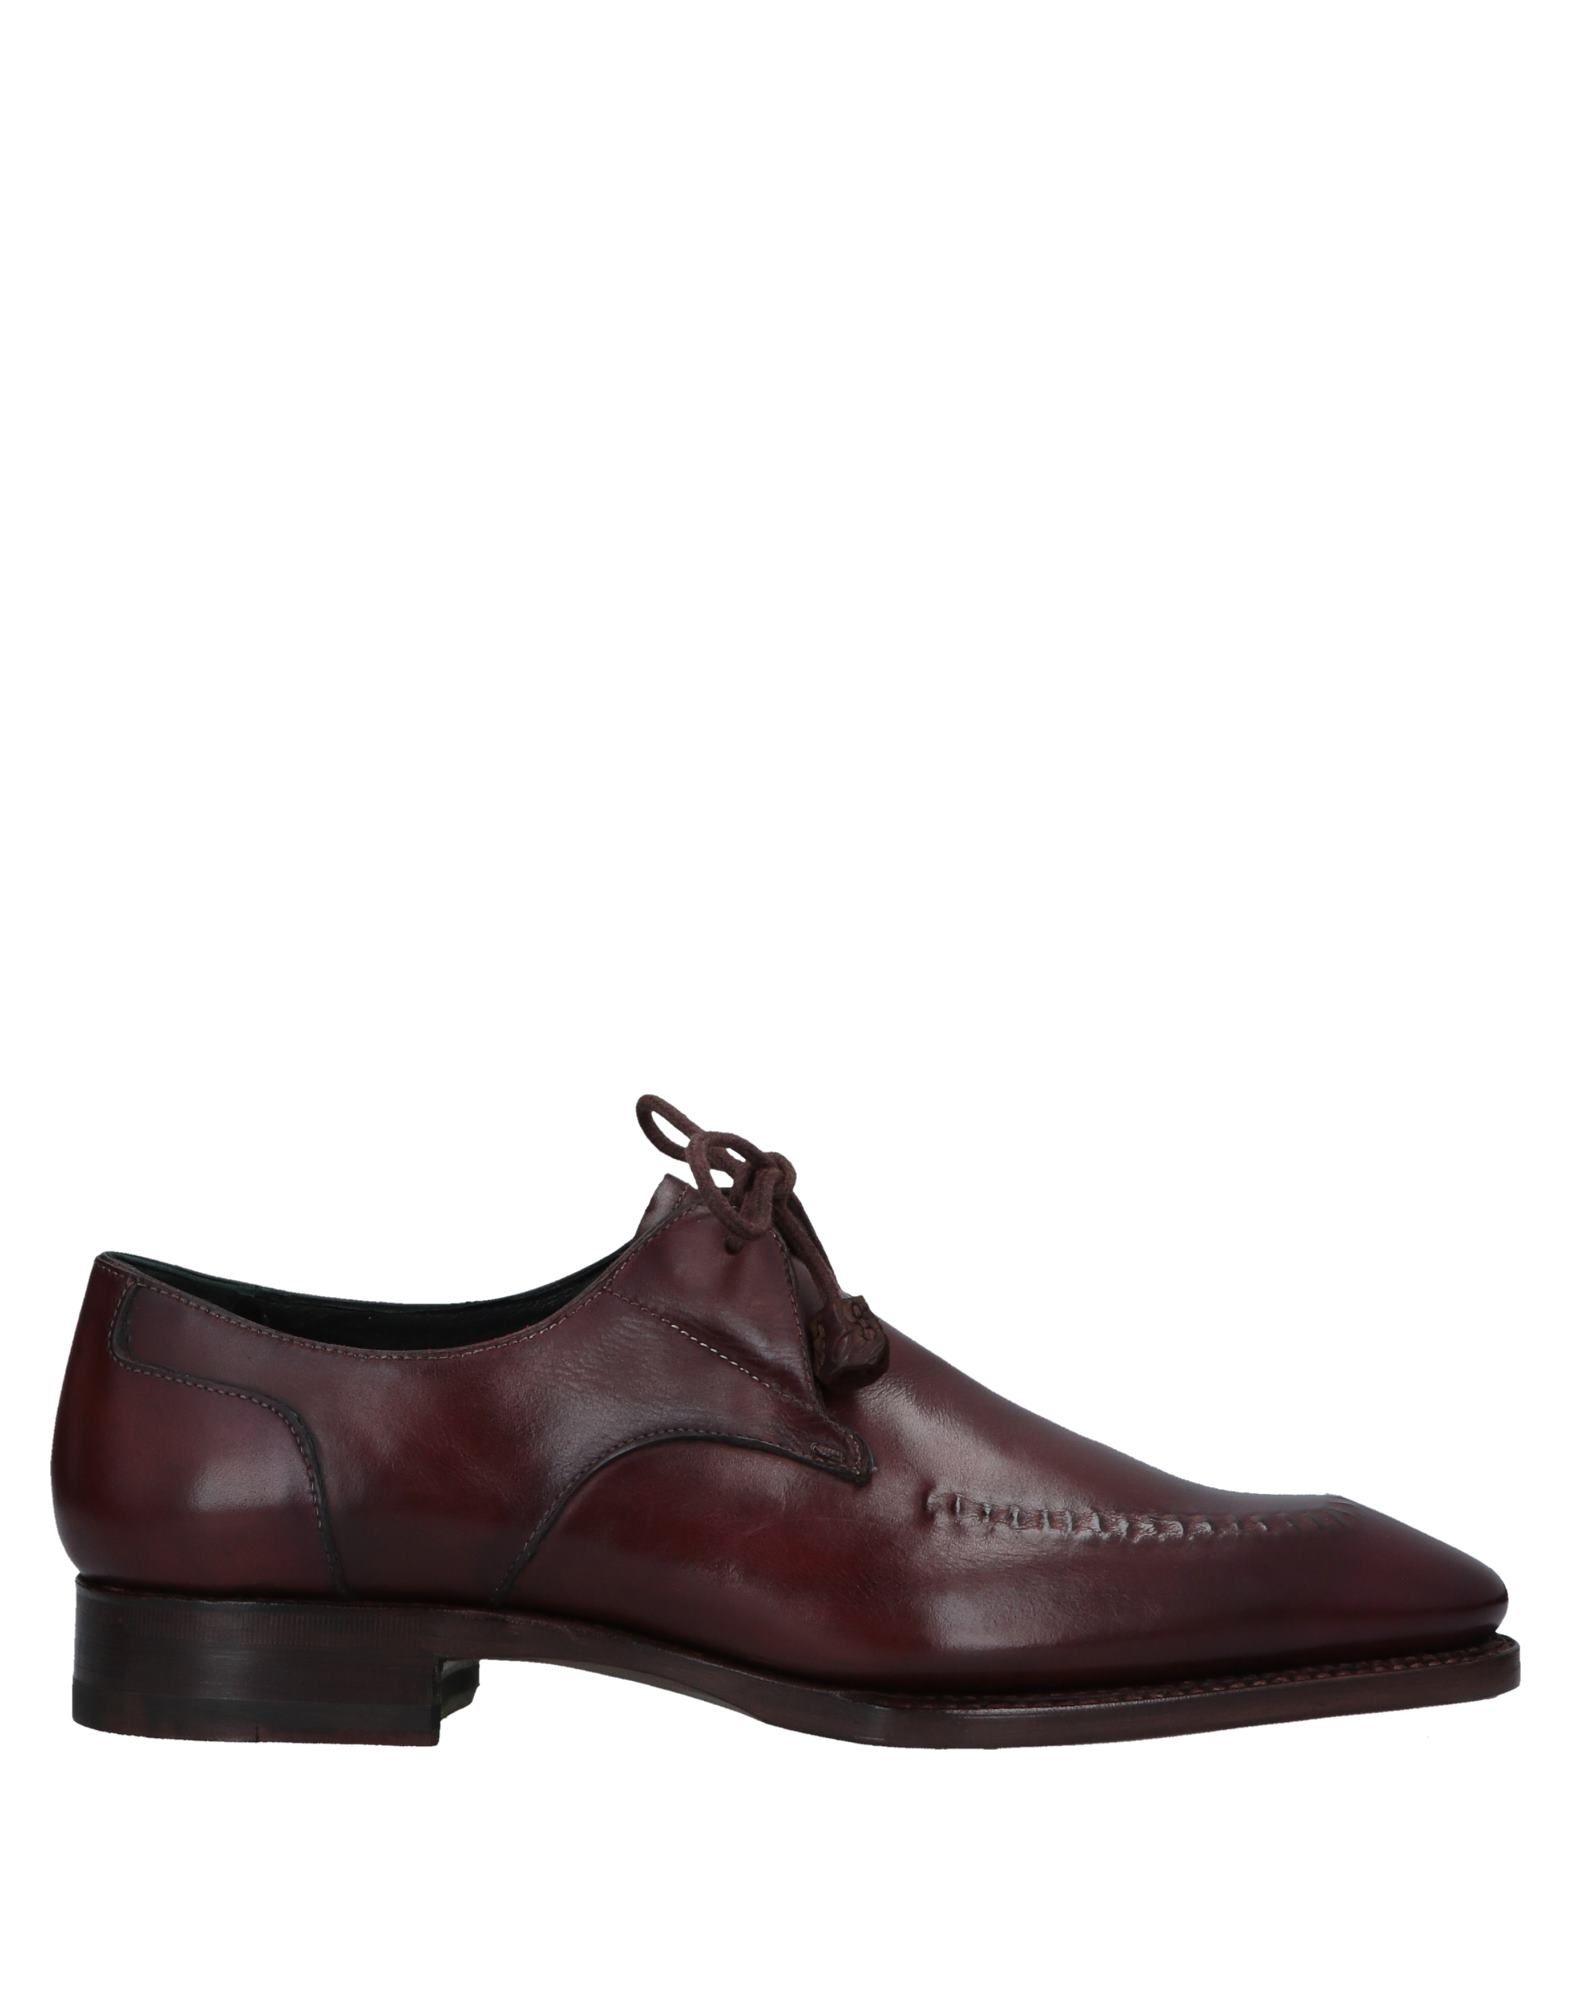 ZENOBI Обувь на шнурках сандалии ия 2017 круглый нос летняя обувь кожаная обувь обувь с пряжечной кожаная обувь